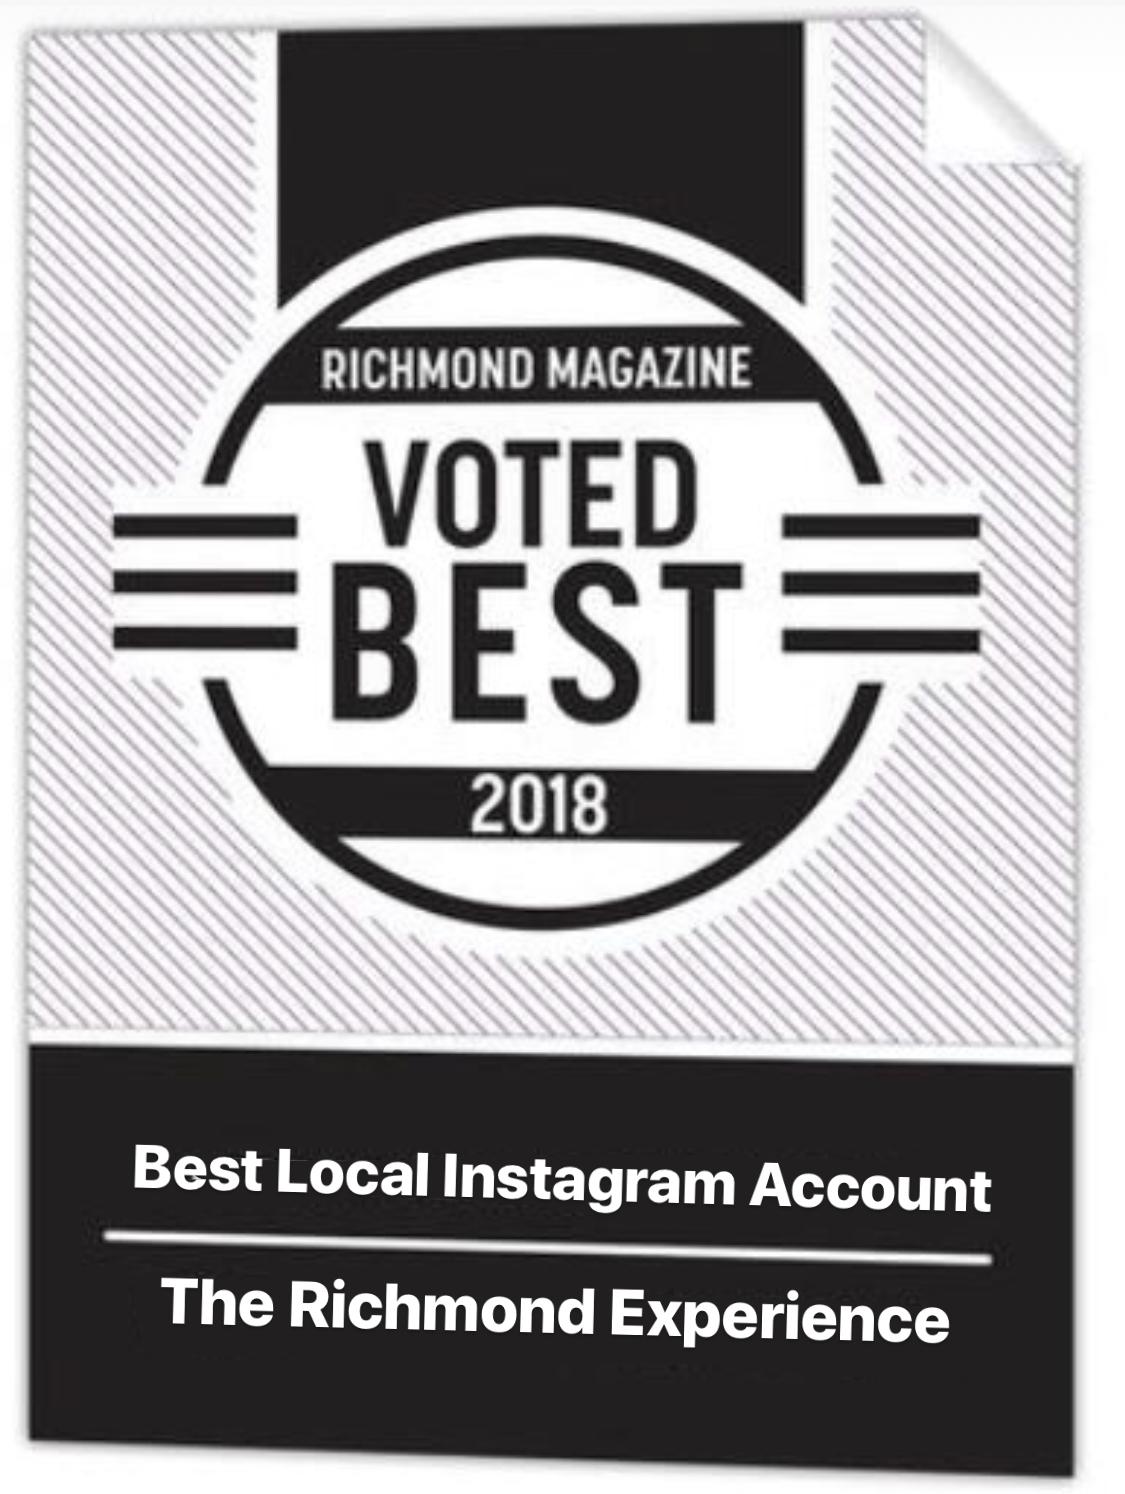 Voted Best Local Instagram by the readers of Richmond Magazine - Richmond Magazine